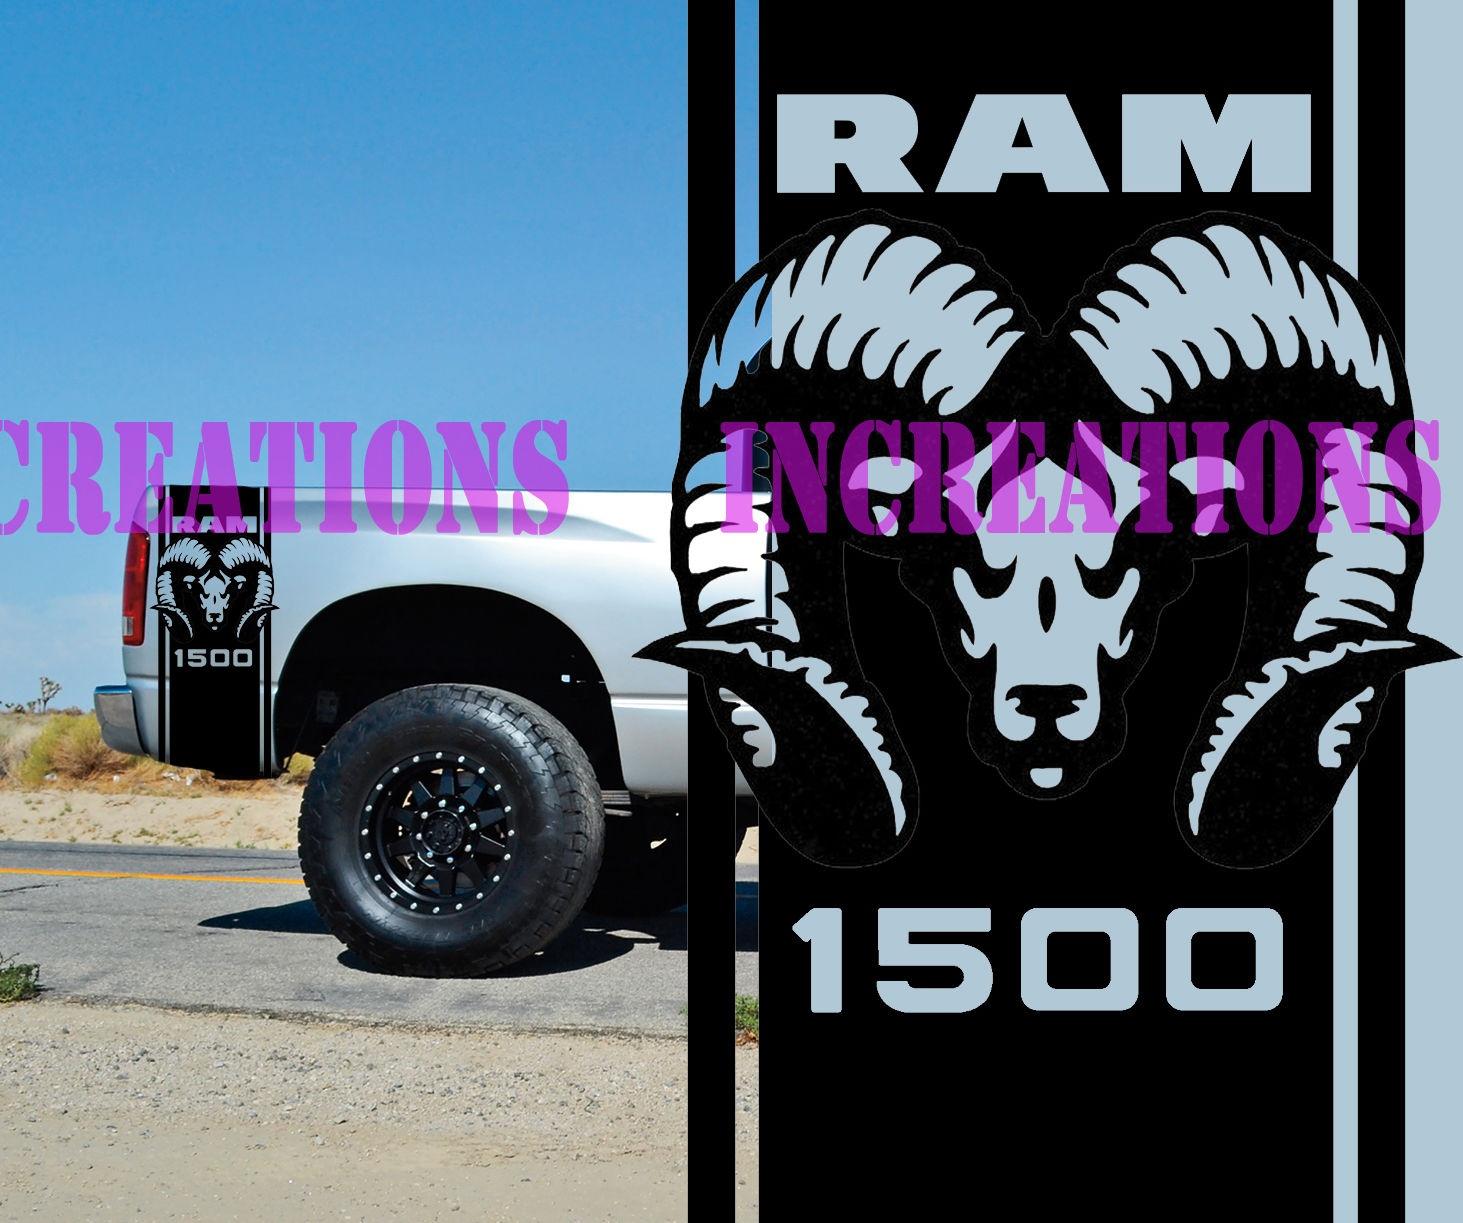 For universal 1set 2pcs hemi dodge ram 1500 bed stripes truck decals mopar stickers set of 2 racing